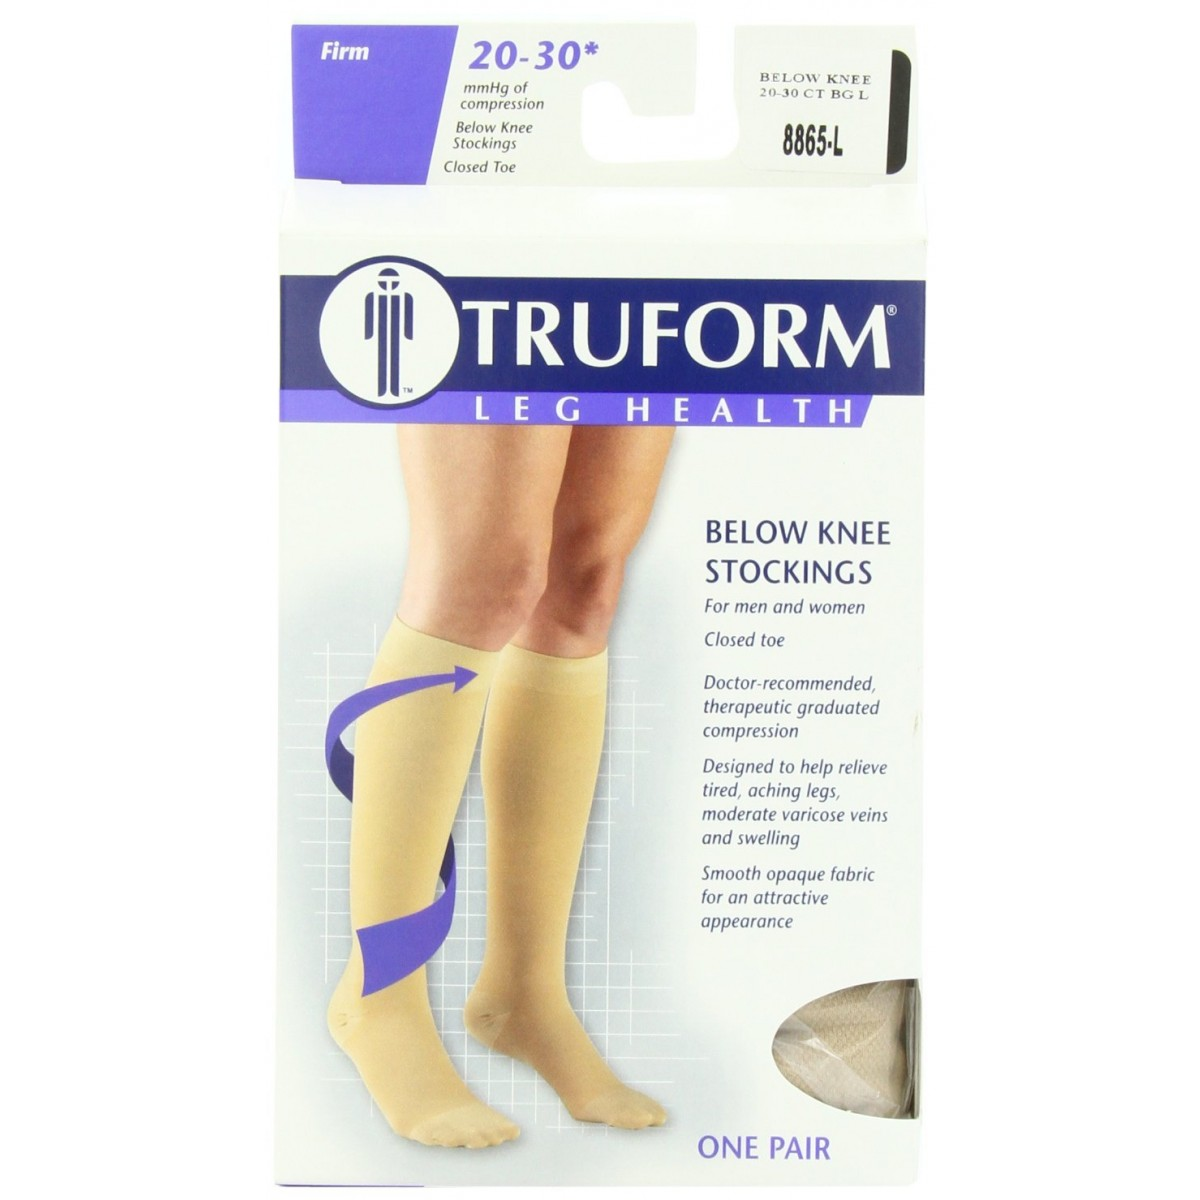 Mens Trueform Leg Health Below Knee Compression Socks Beige LARGE 8865